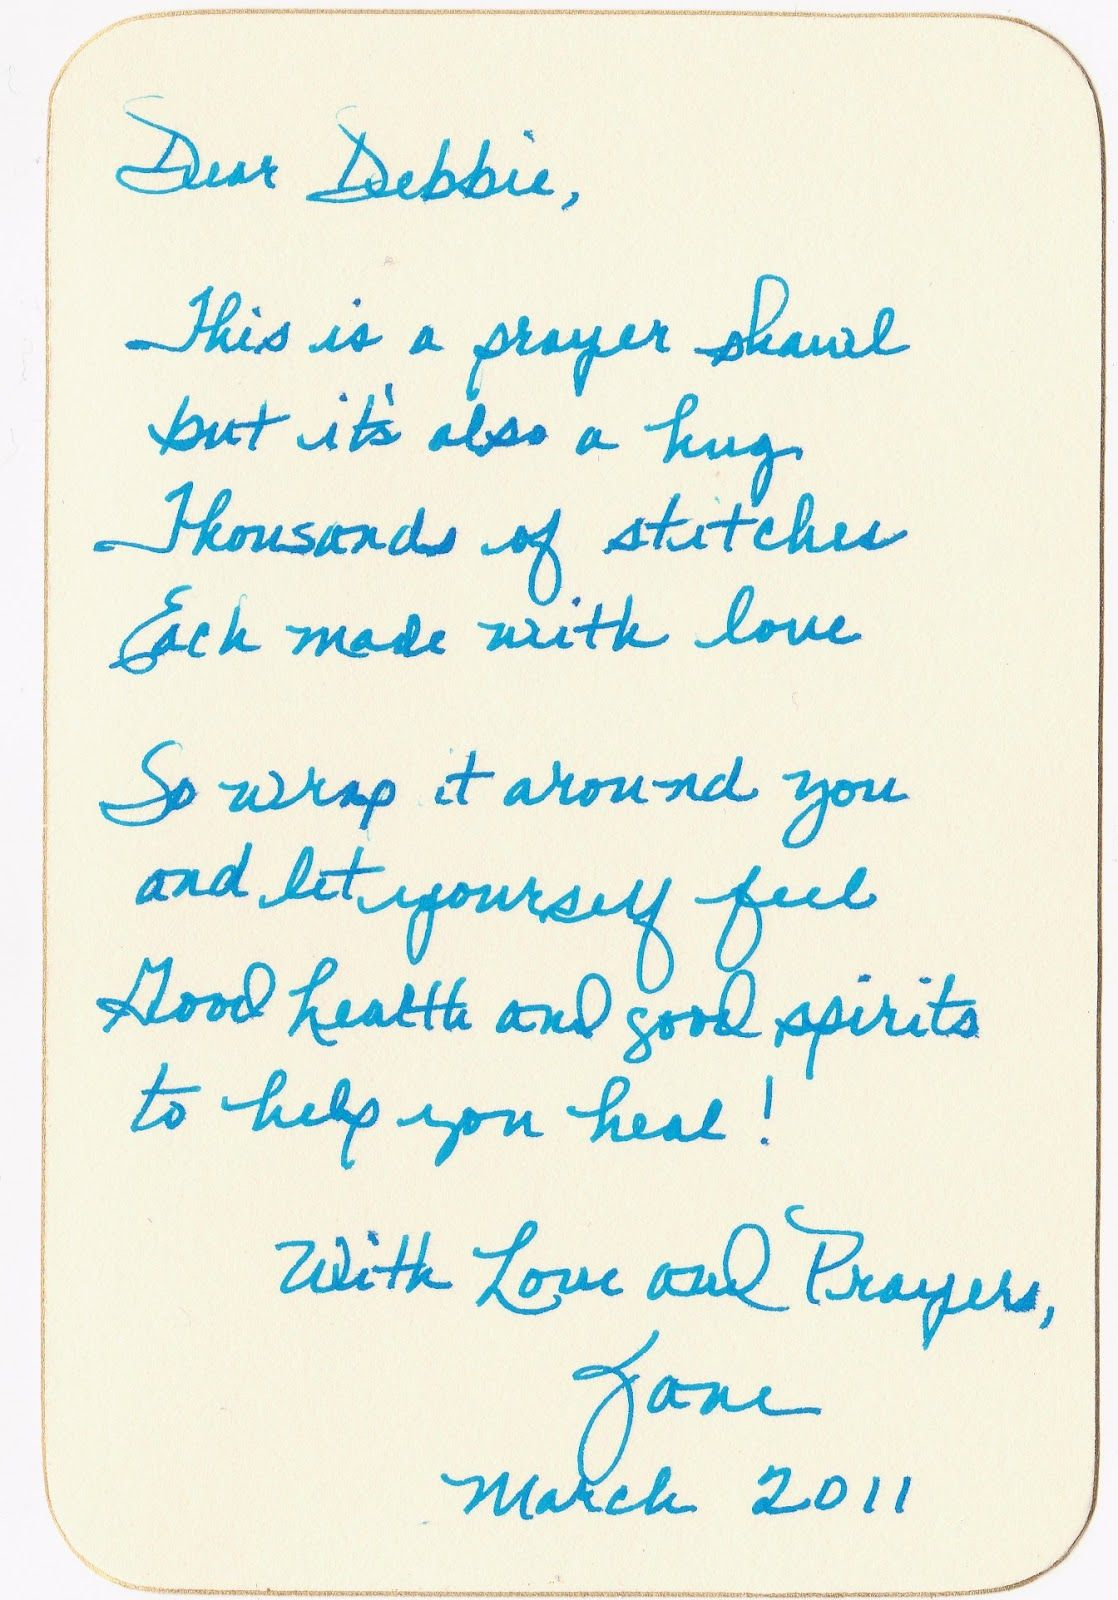 Prayer Shawl Poem | Prayer Shawls | Pinterest | Prayer shawl, Shawl ...